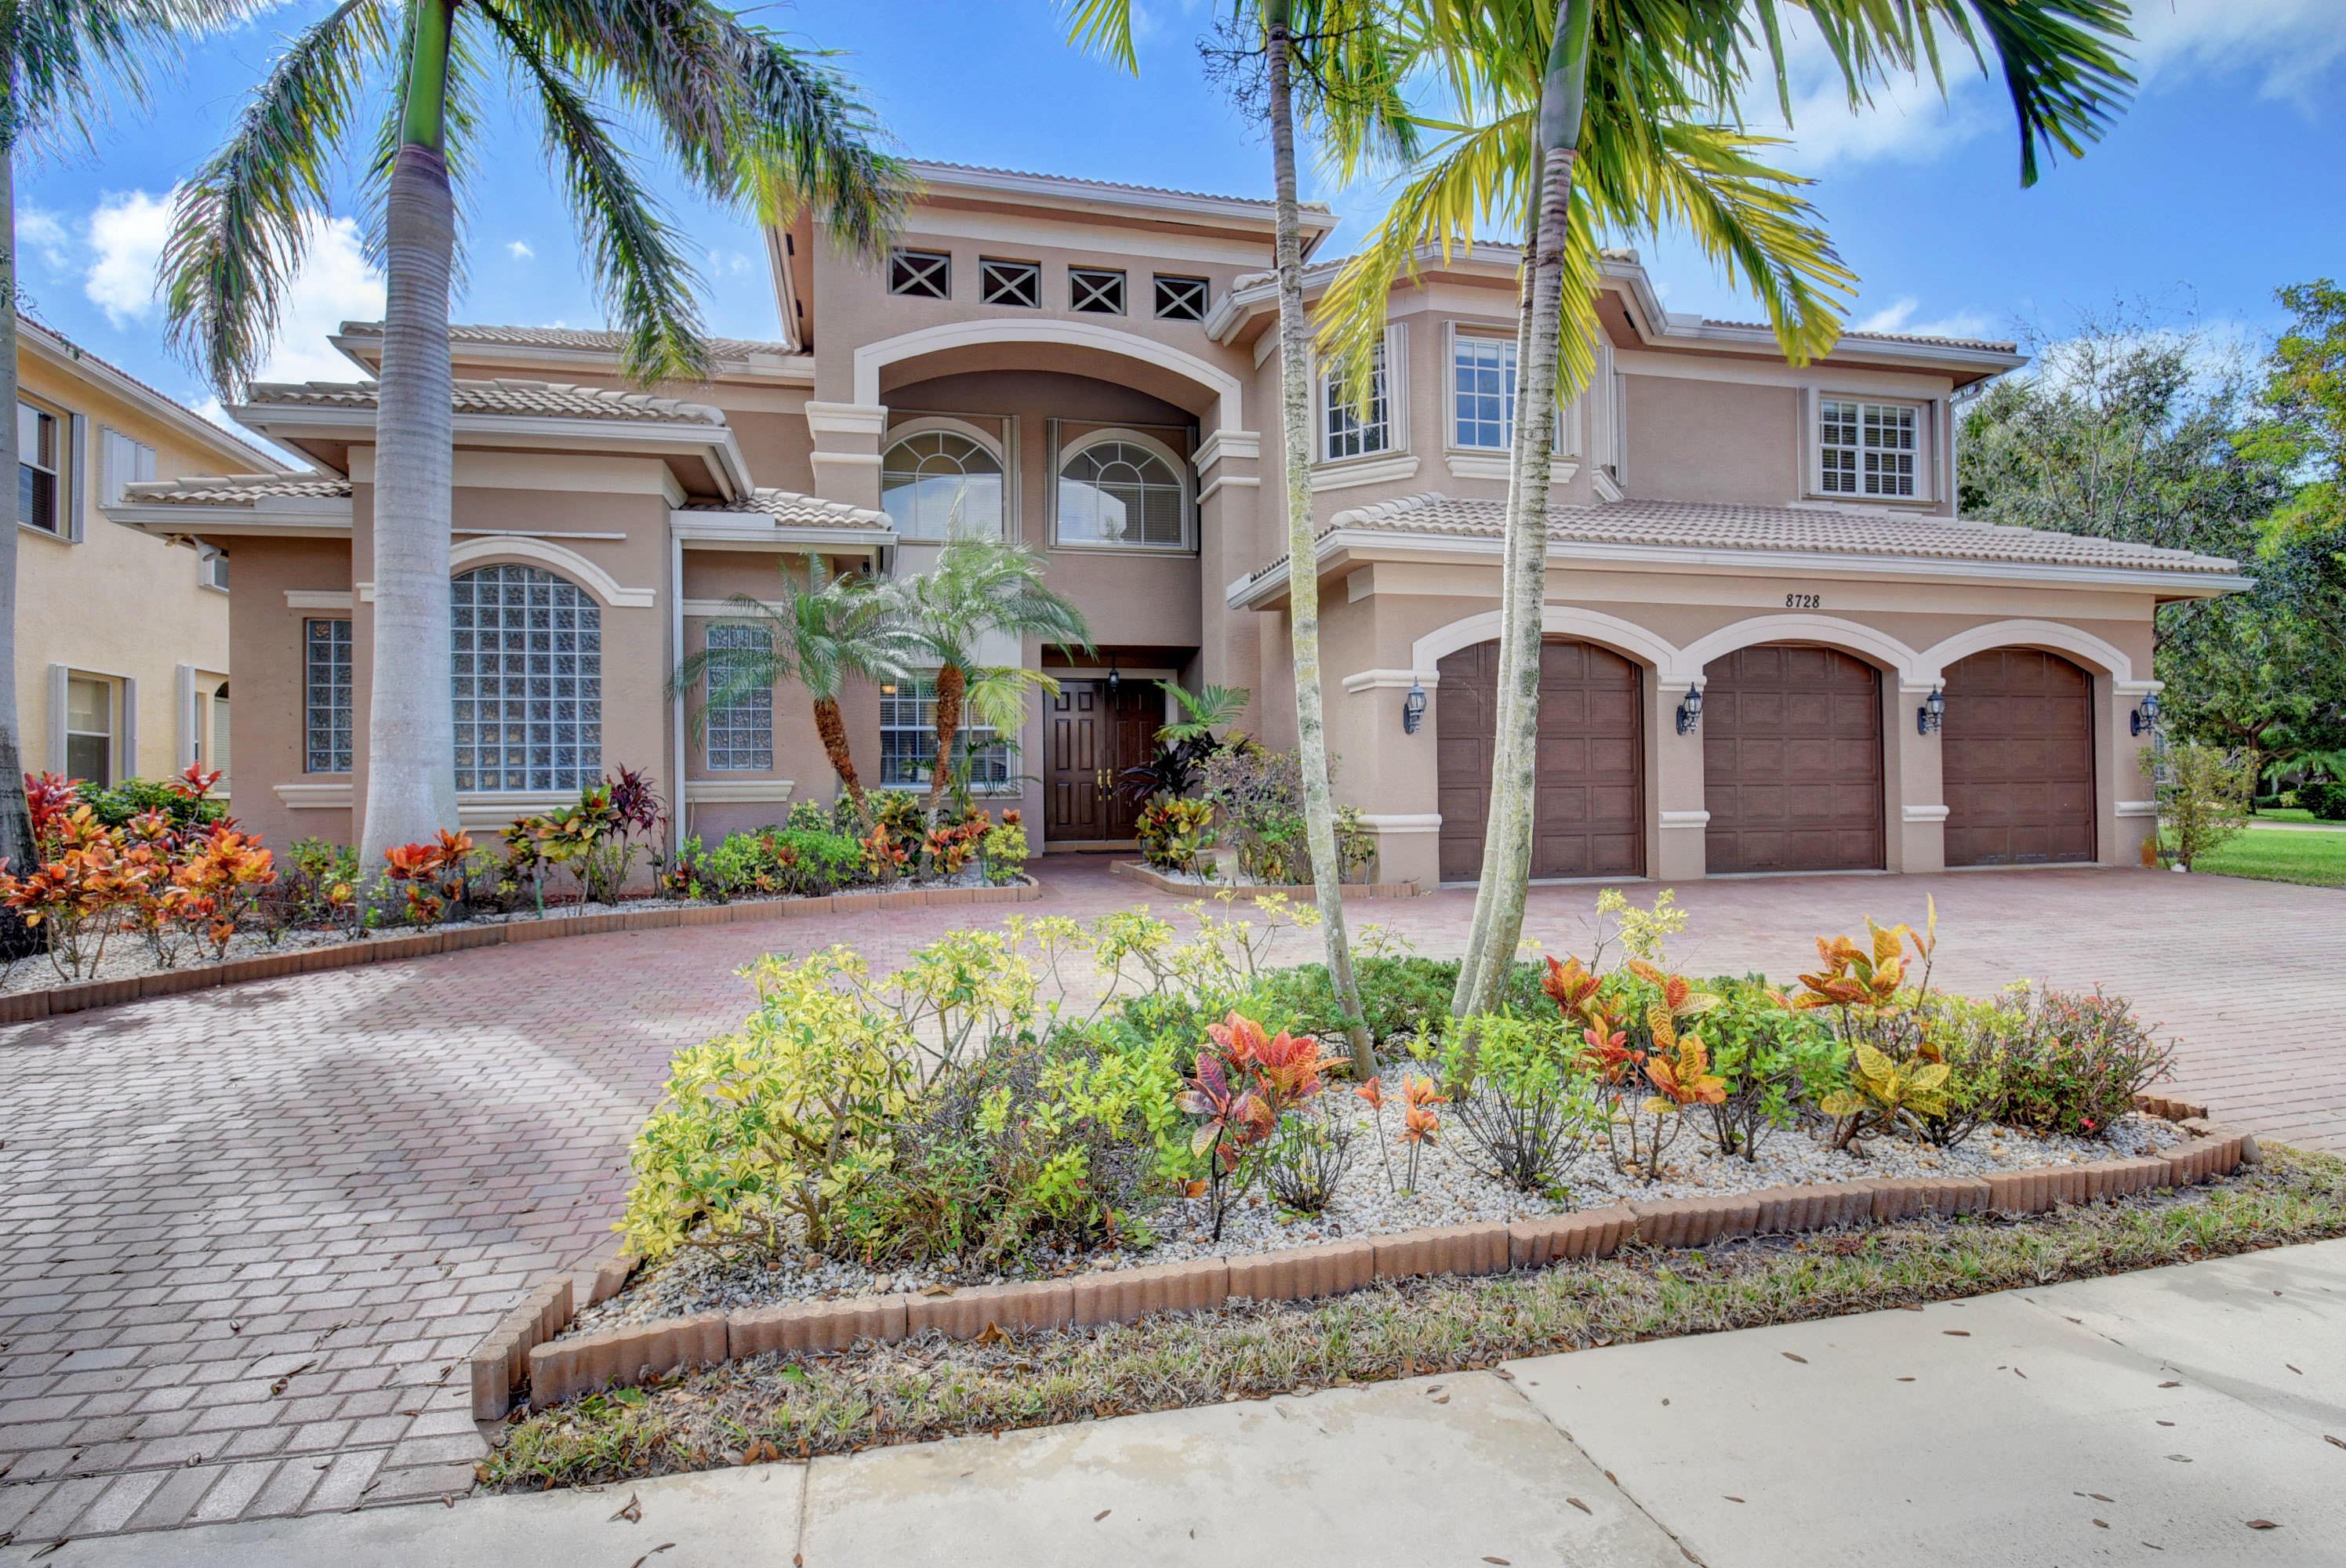 8728 Thornbrook Terrace Pt Point  Boynton Beach, FL 33473